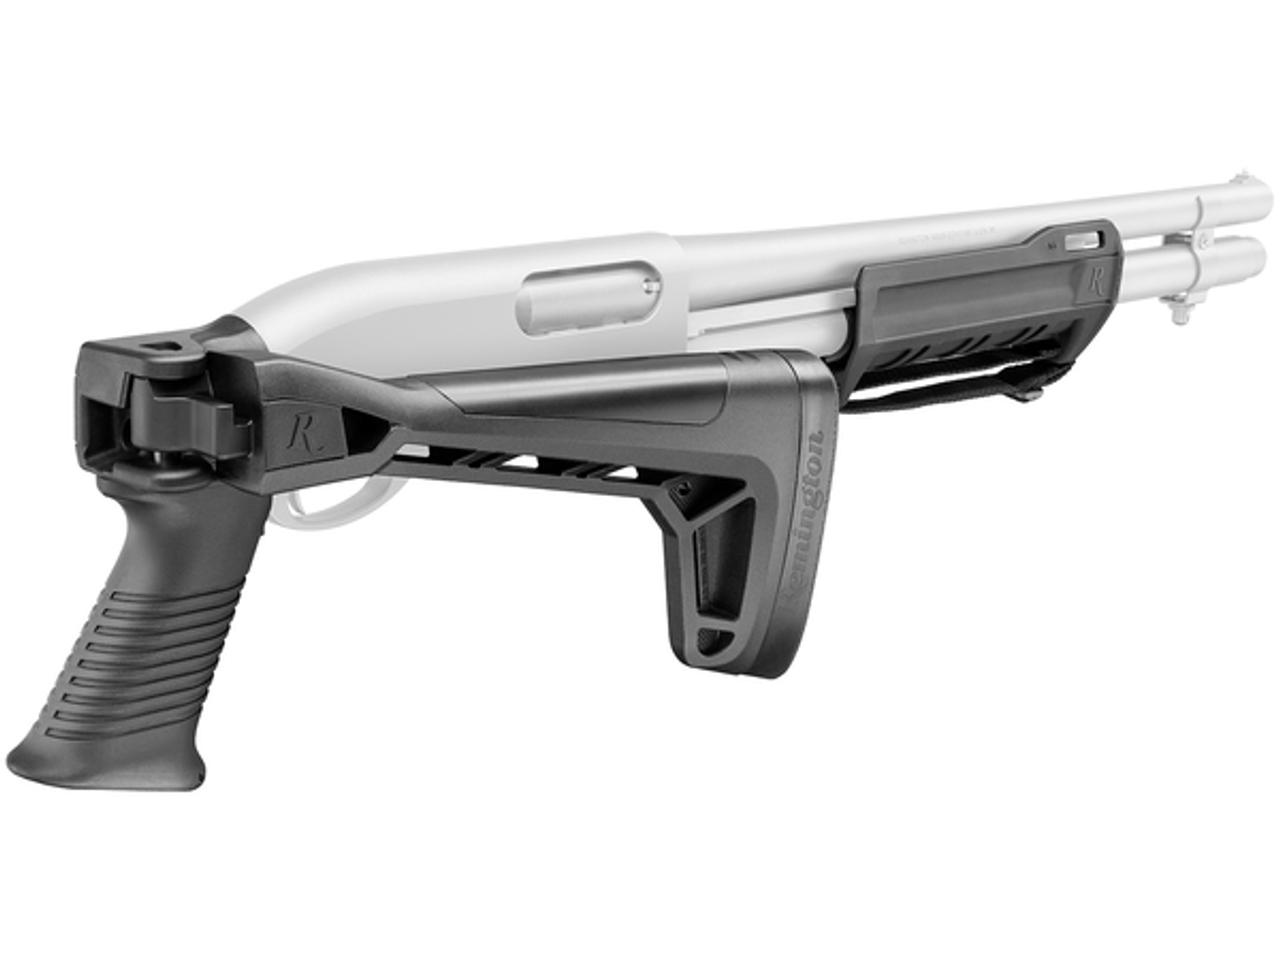 Remington Folding Stock & Forend Kit, 12ga or 20ga 870, folded